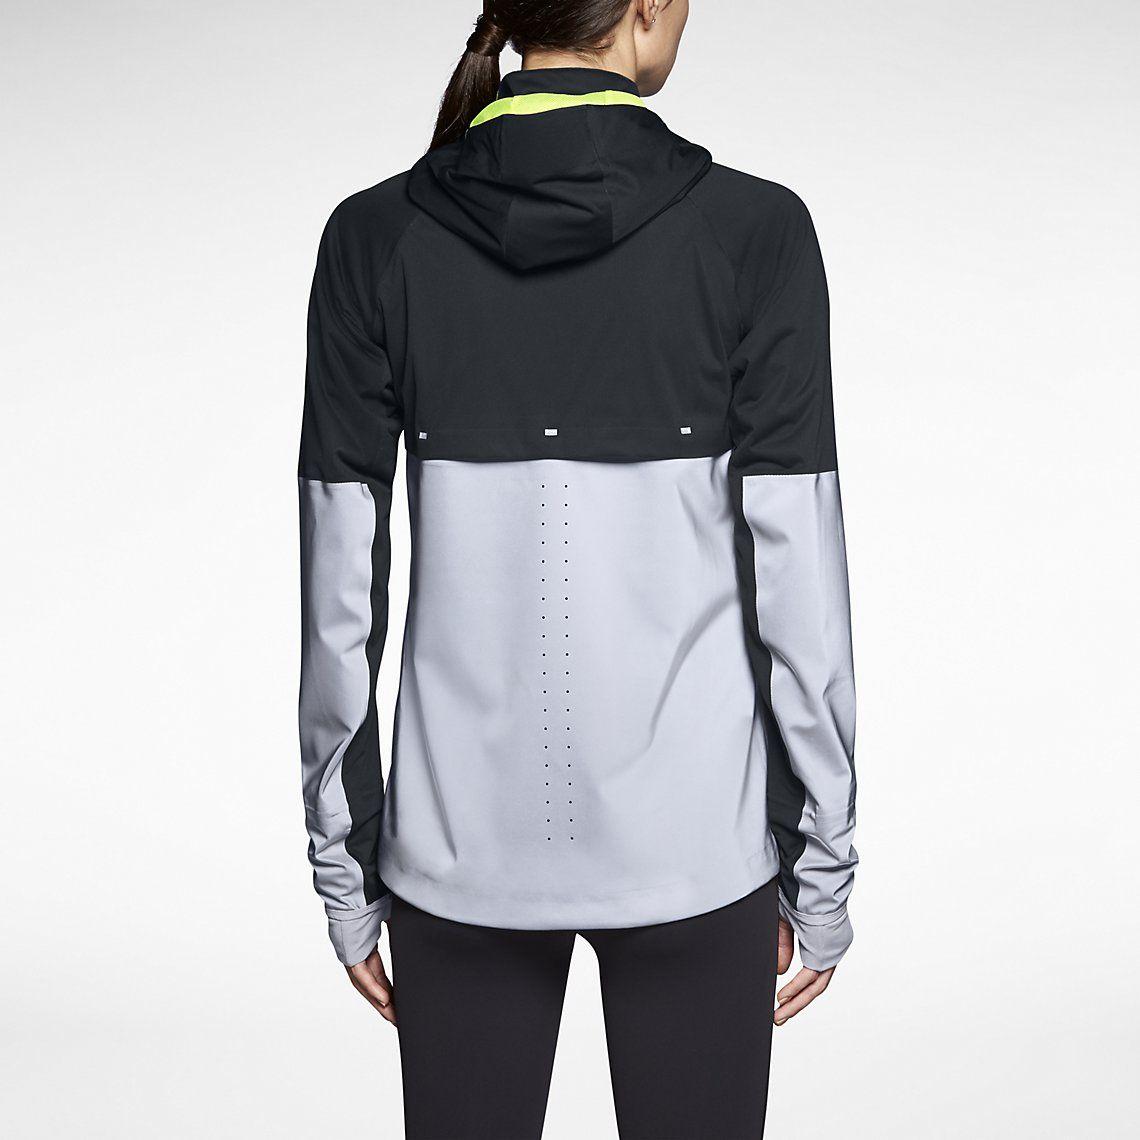 nike womens vapor running jacket white/silver plastic spray